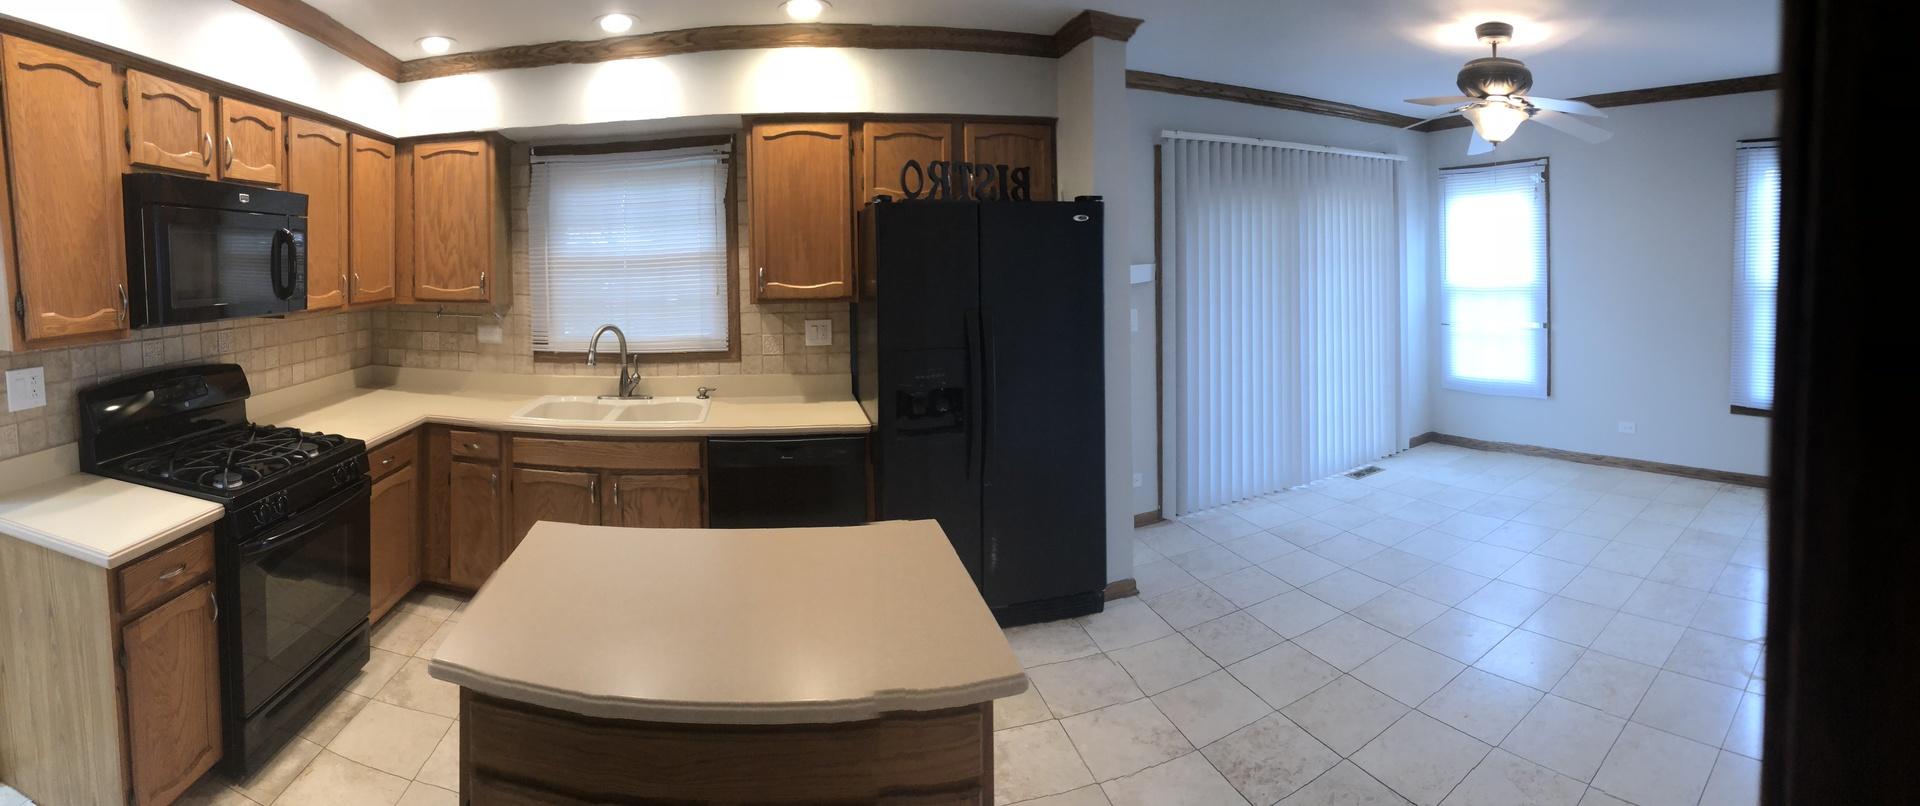 , ELK GROVE VILLAGE, Illinois, 60007